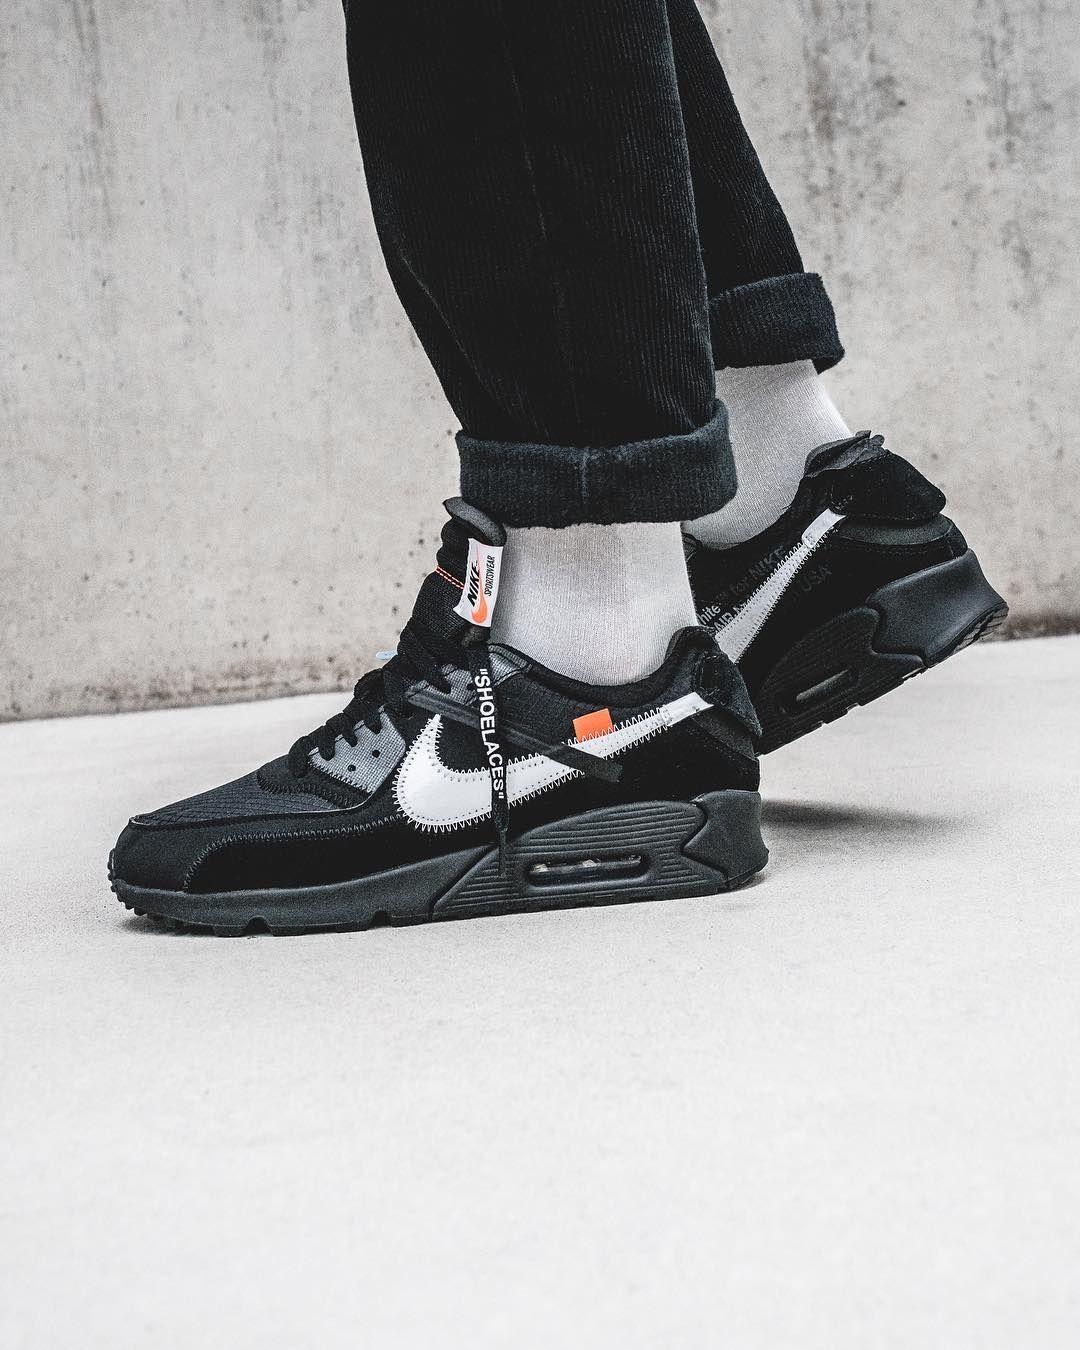 Pin By 𝐡𝐢𝐥 On F A S H I O N Sneakers Nike Air Max Nike Air Max 90 Black Nike Air Max White